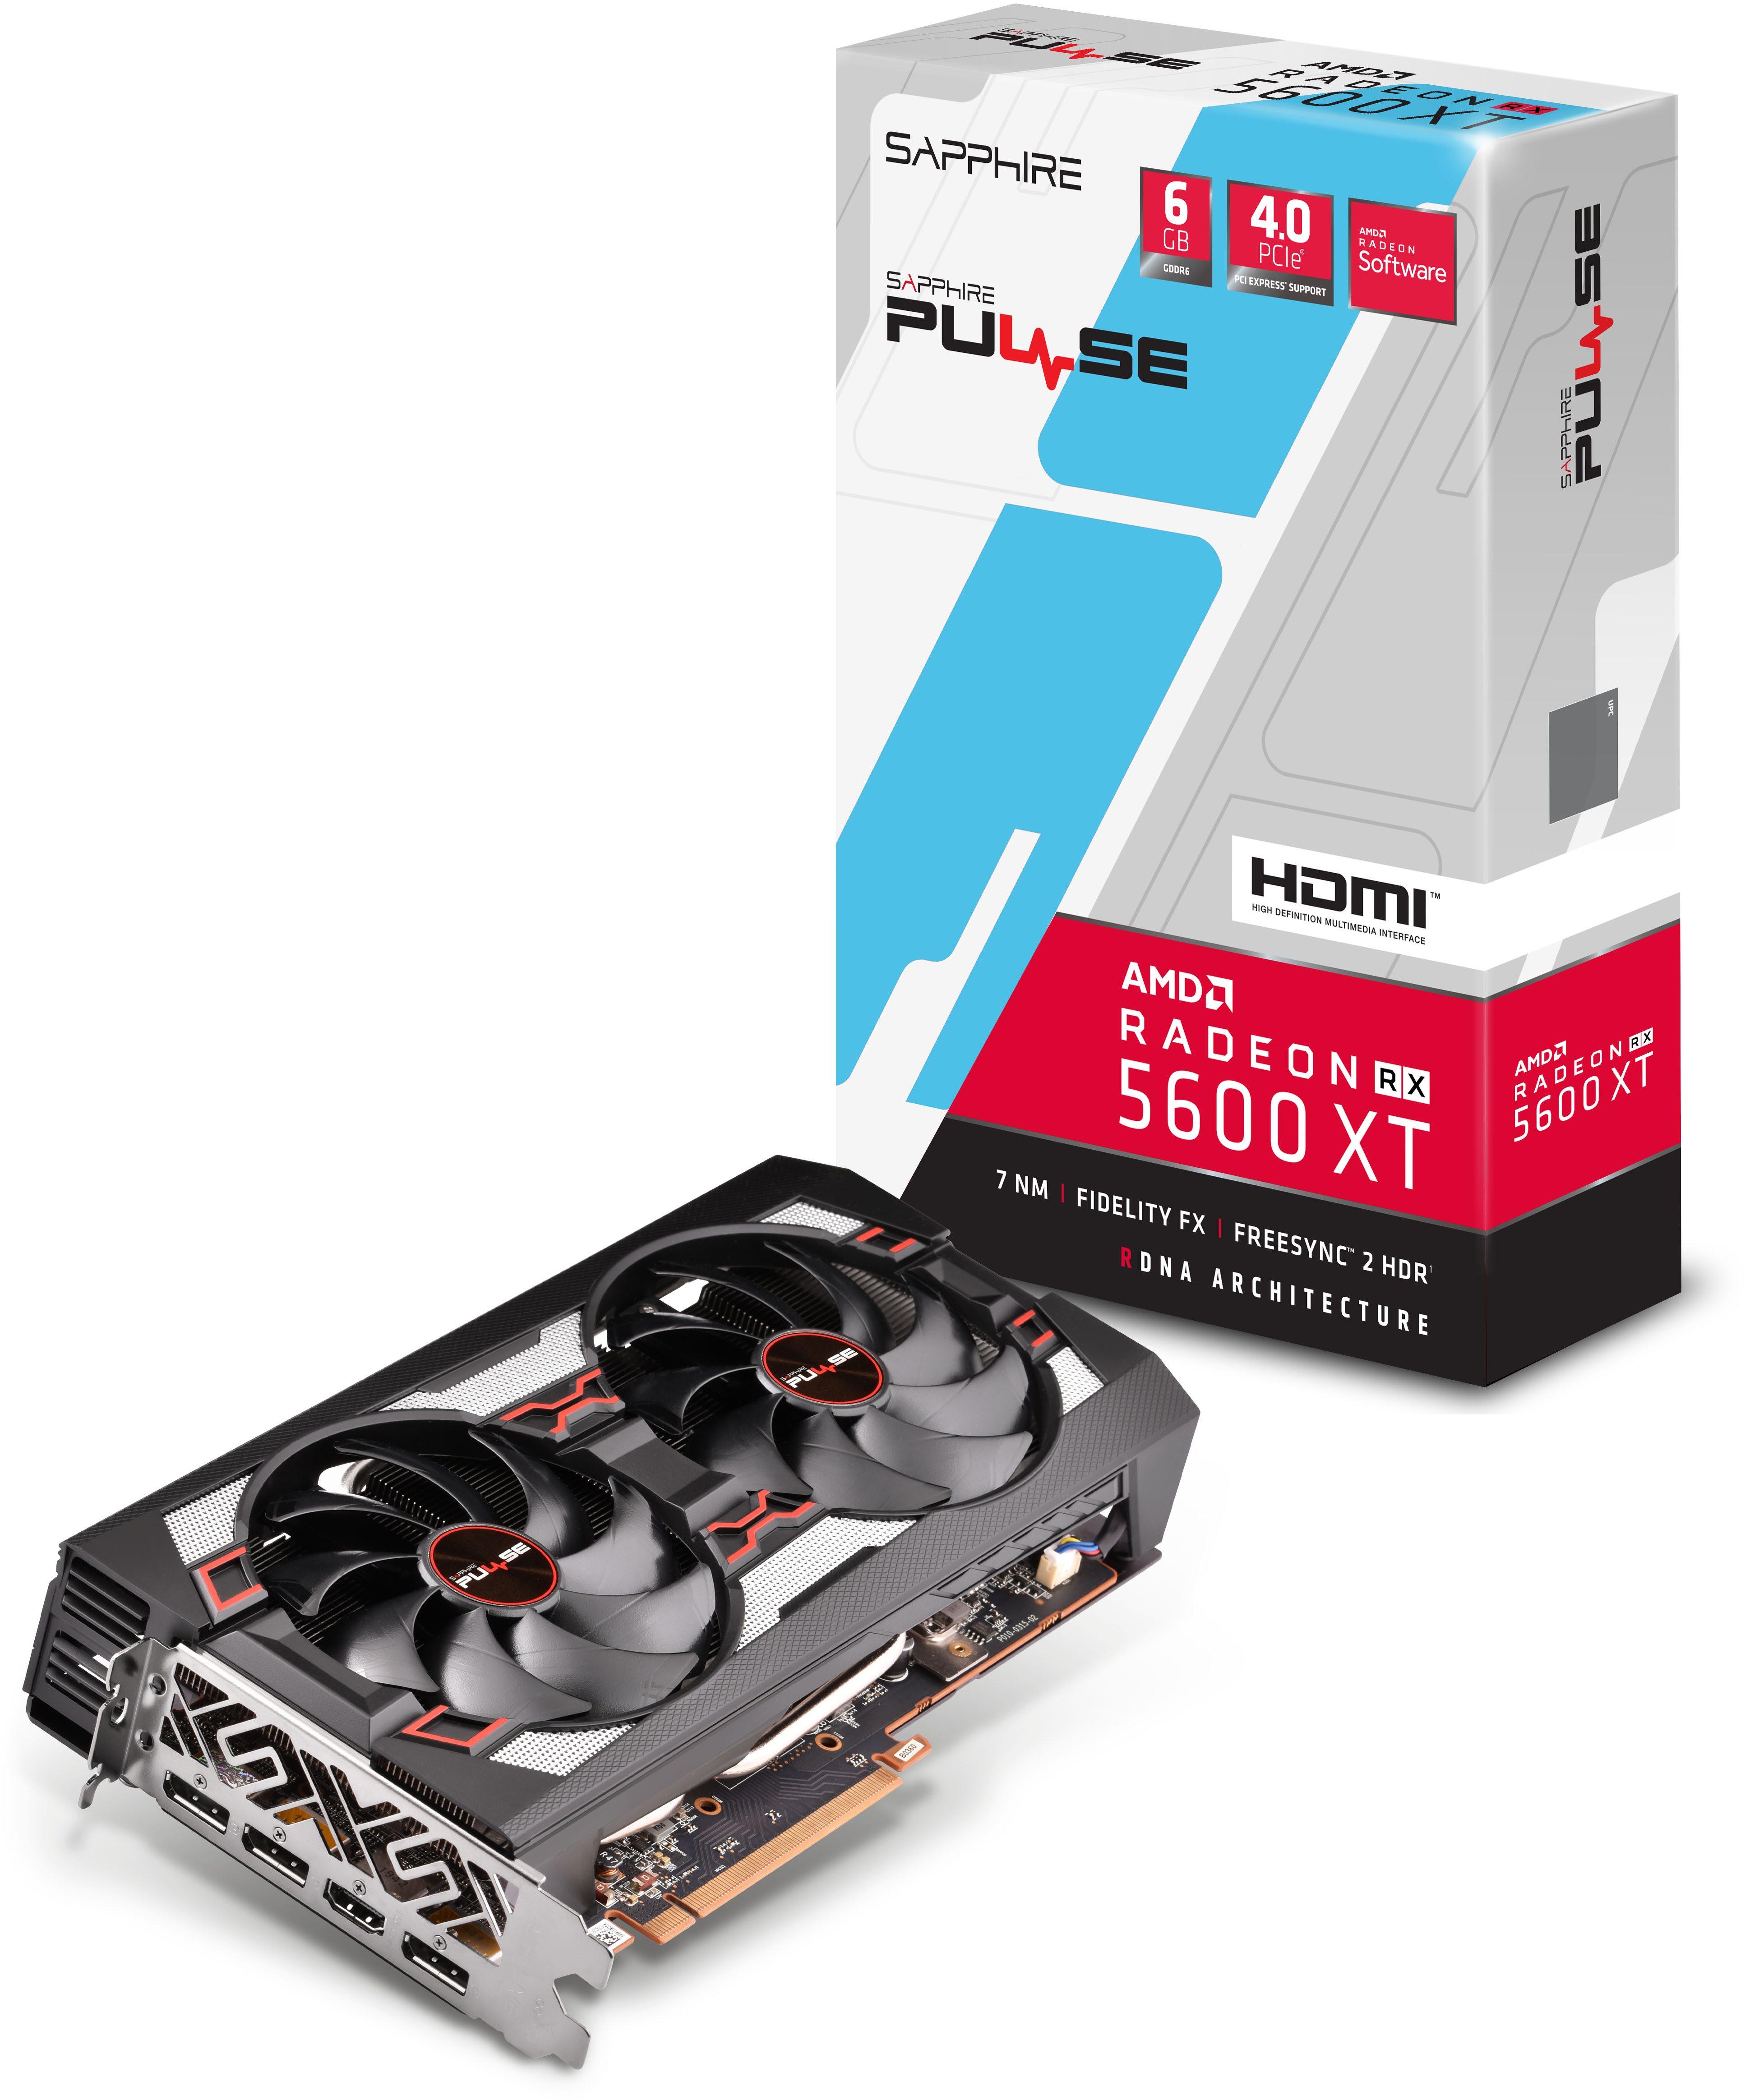 SAPPHIRE PULSE Radeon RX 5600 XT 6G